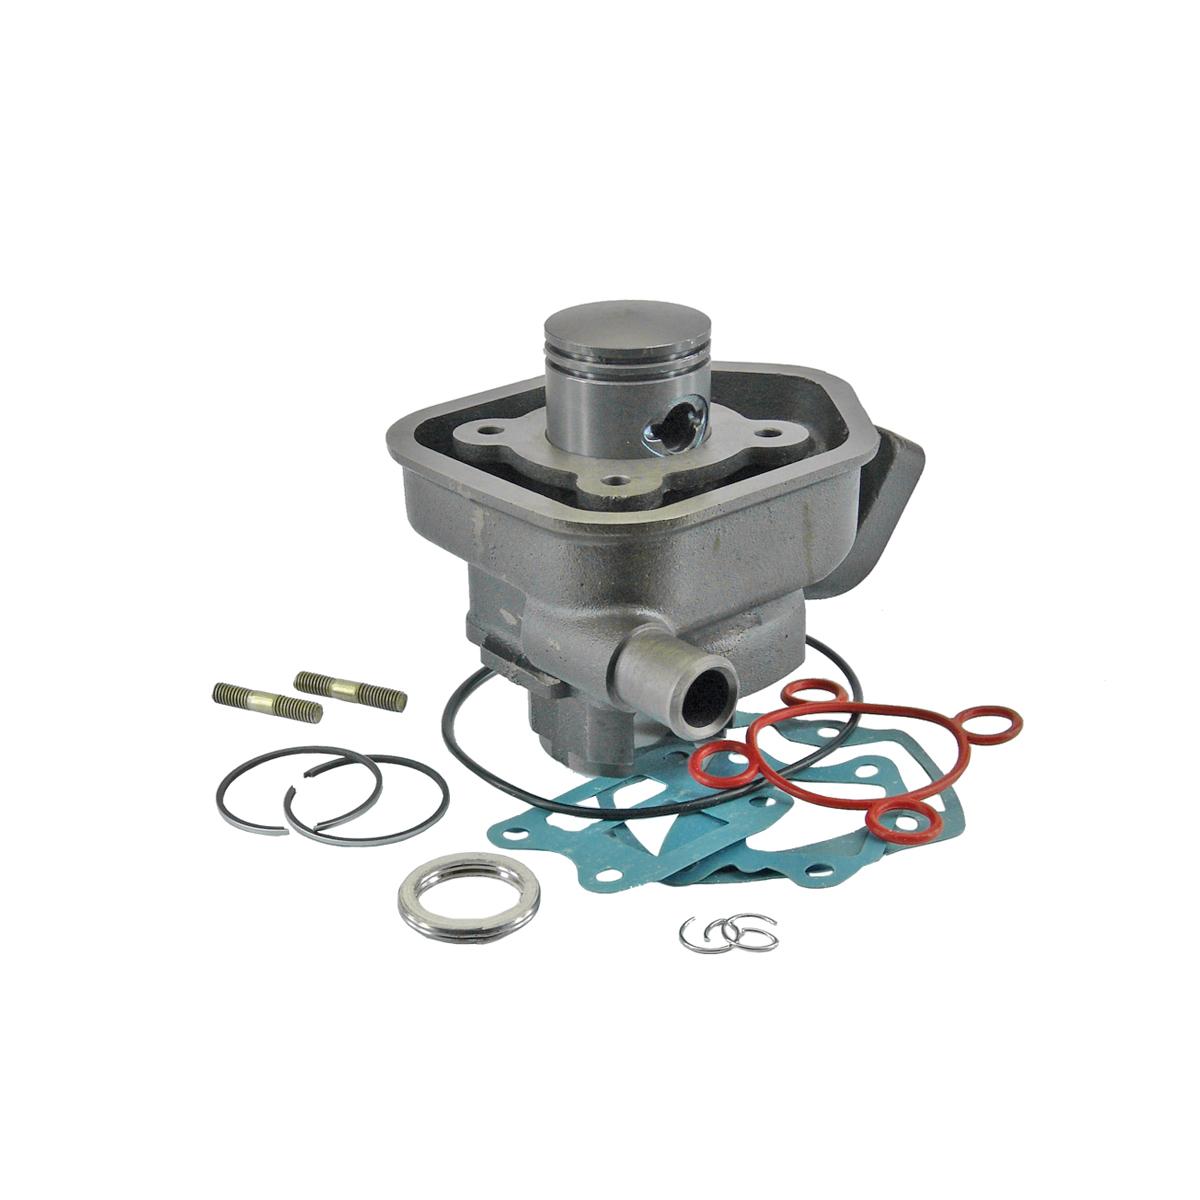 Cylindre D.40 TNT Fonte Liquide Speedfight 50cc